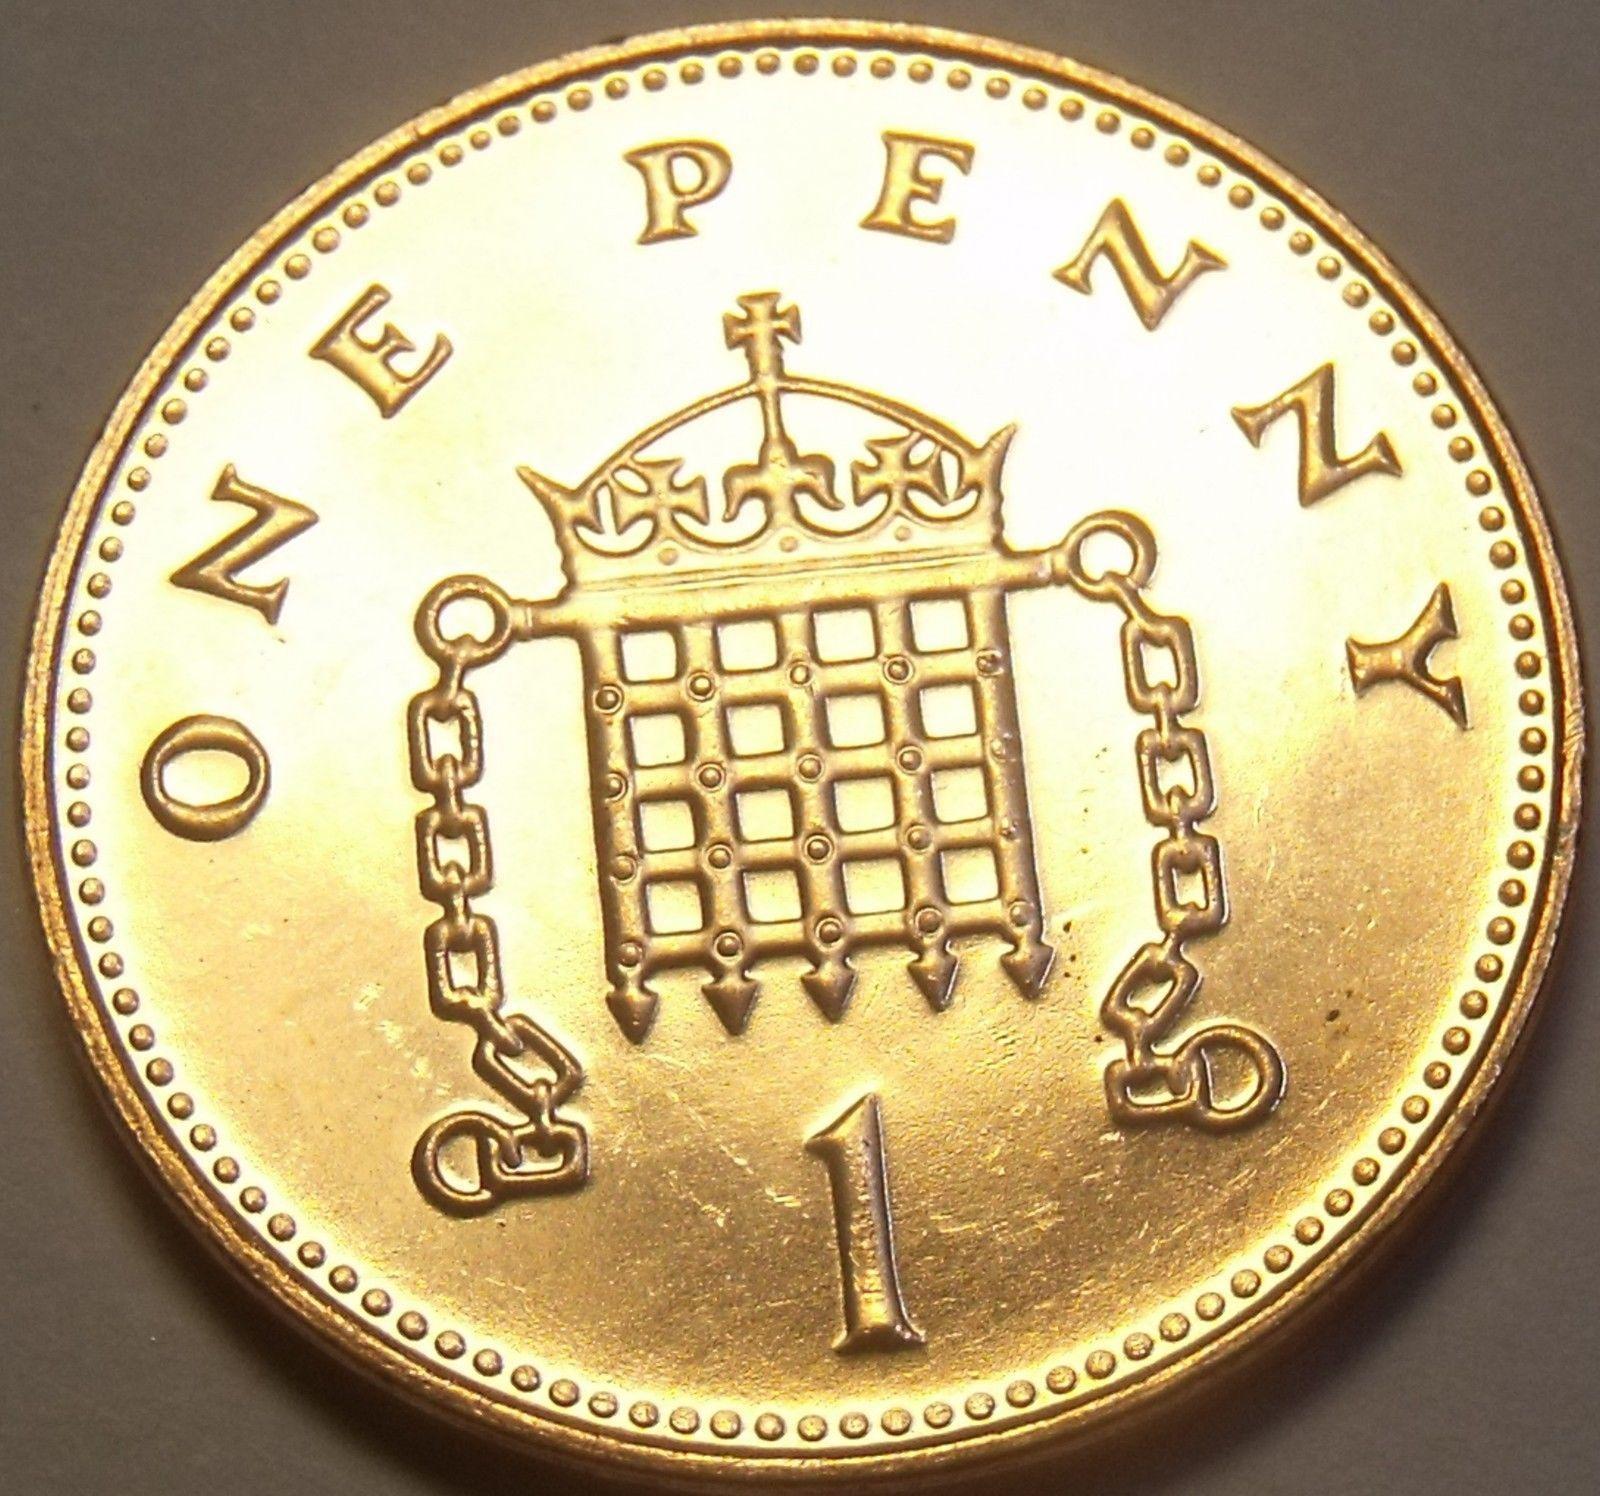 Gem Unc Great Britain 2000 Penny~U K  and 37 similar items